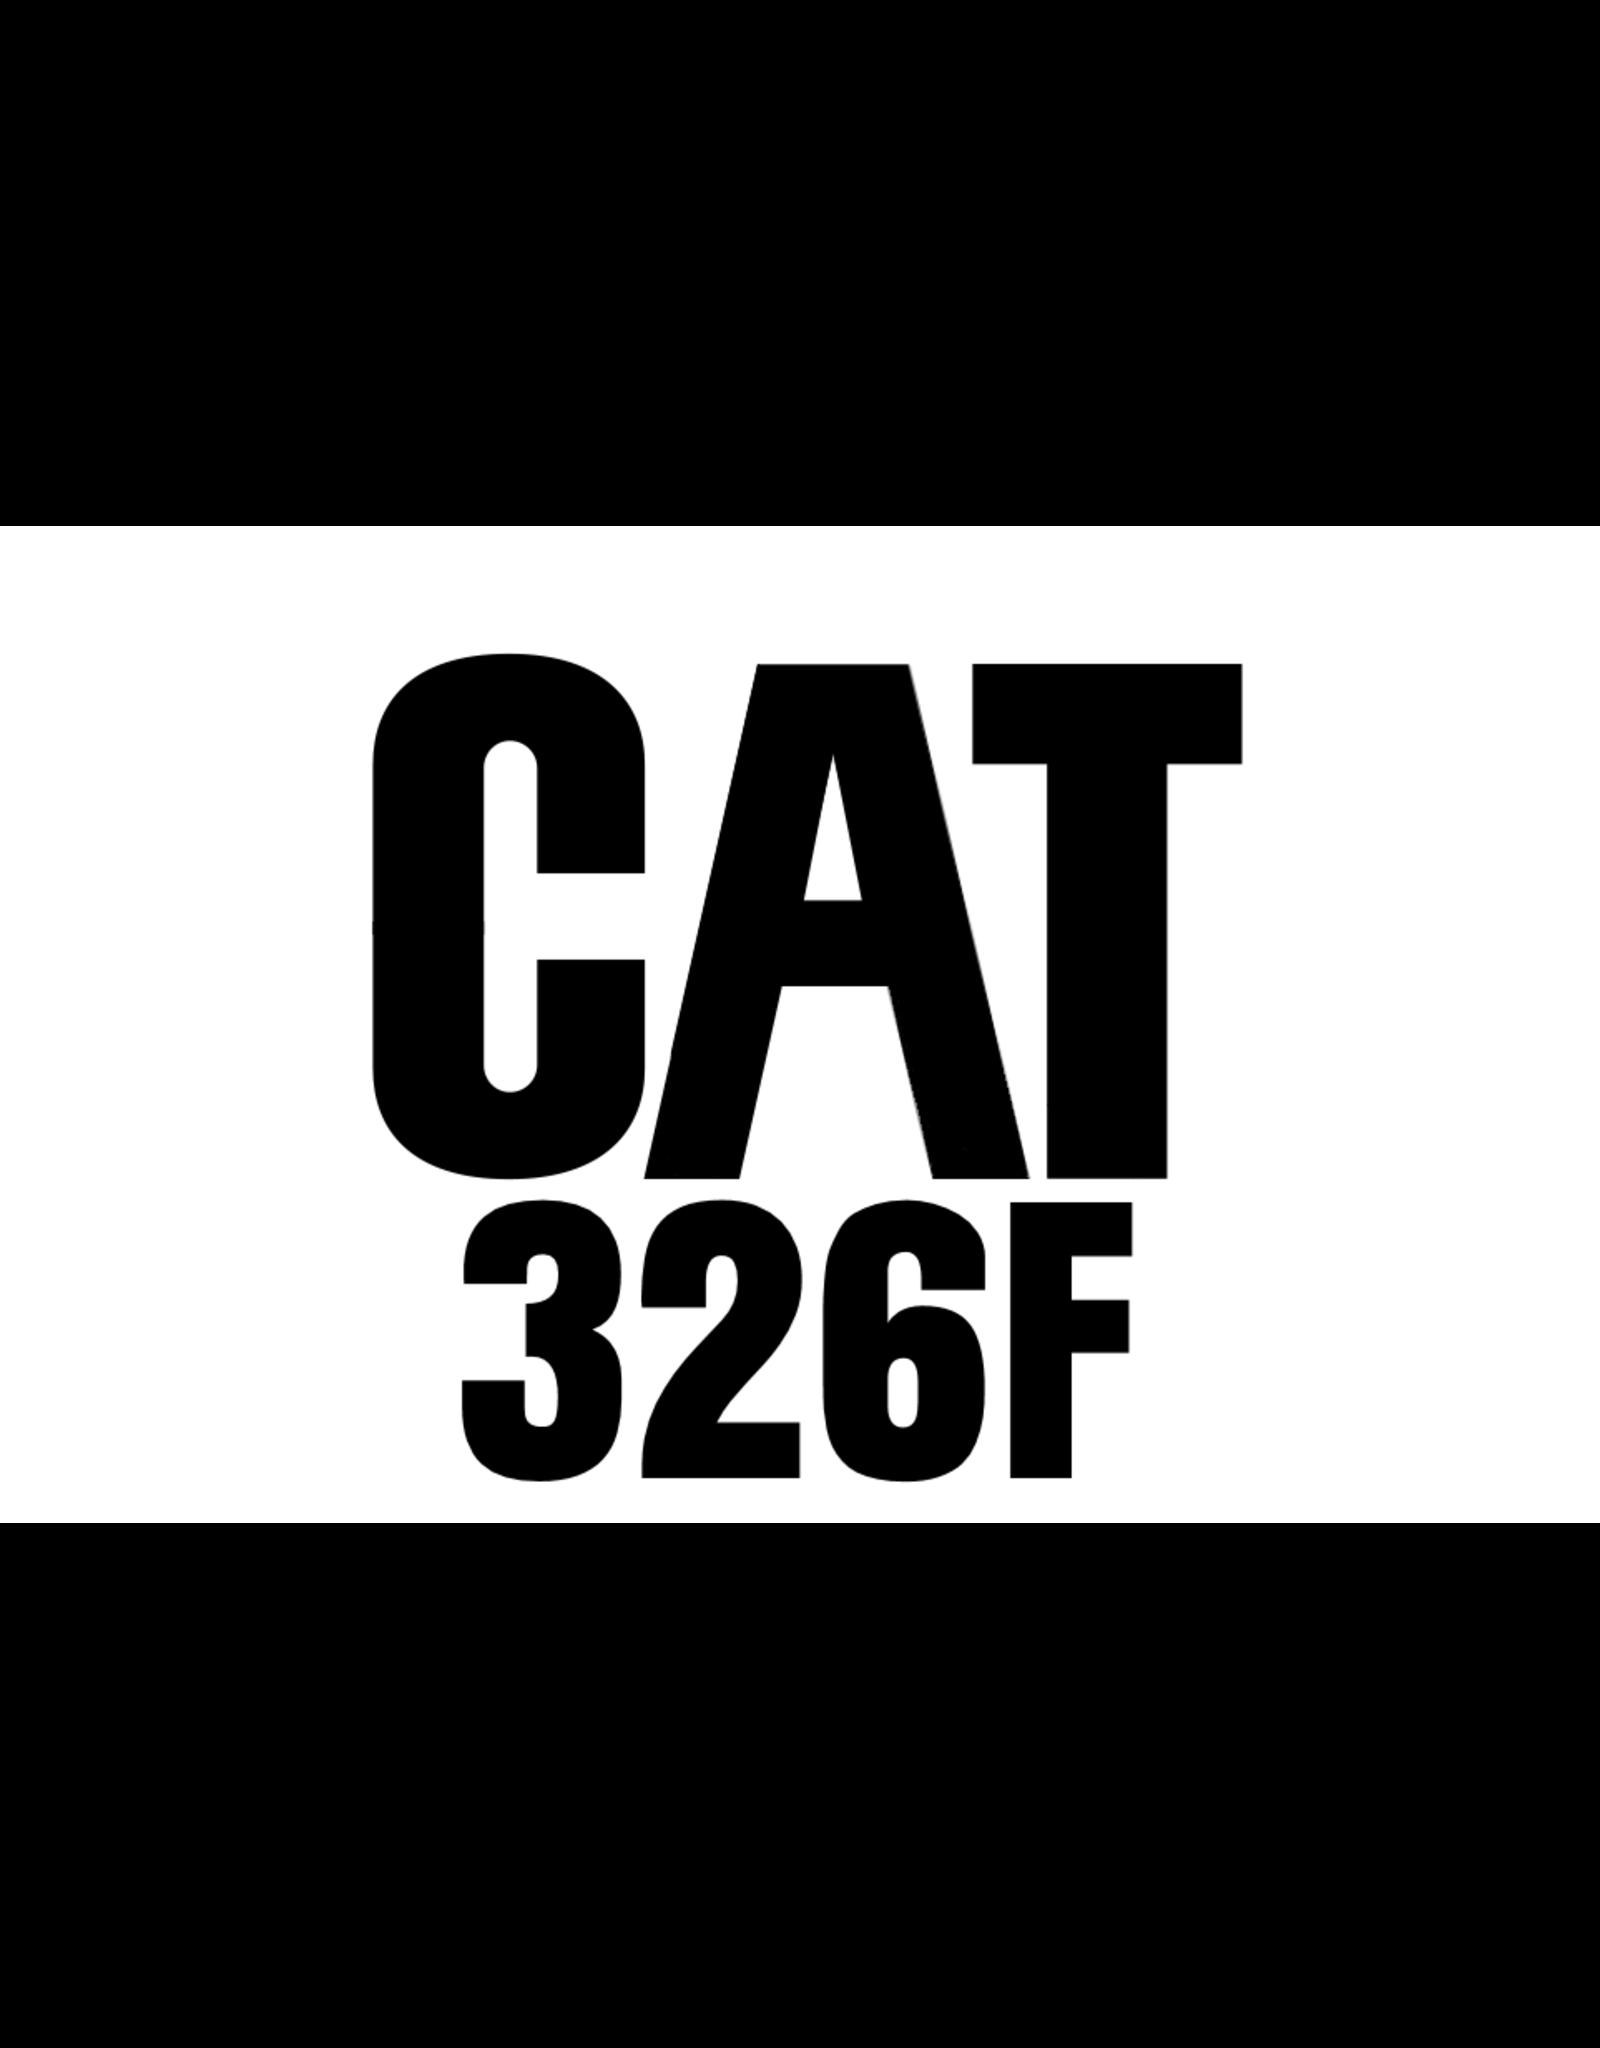 Echle Hartstahl GmbH FOPS for CAT 326F